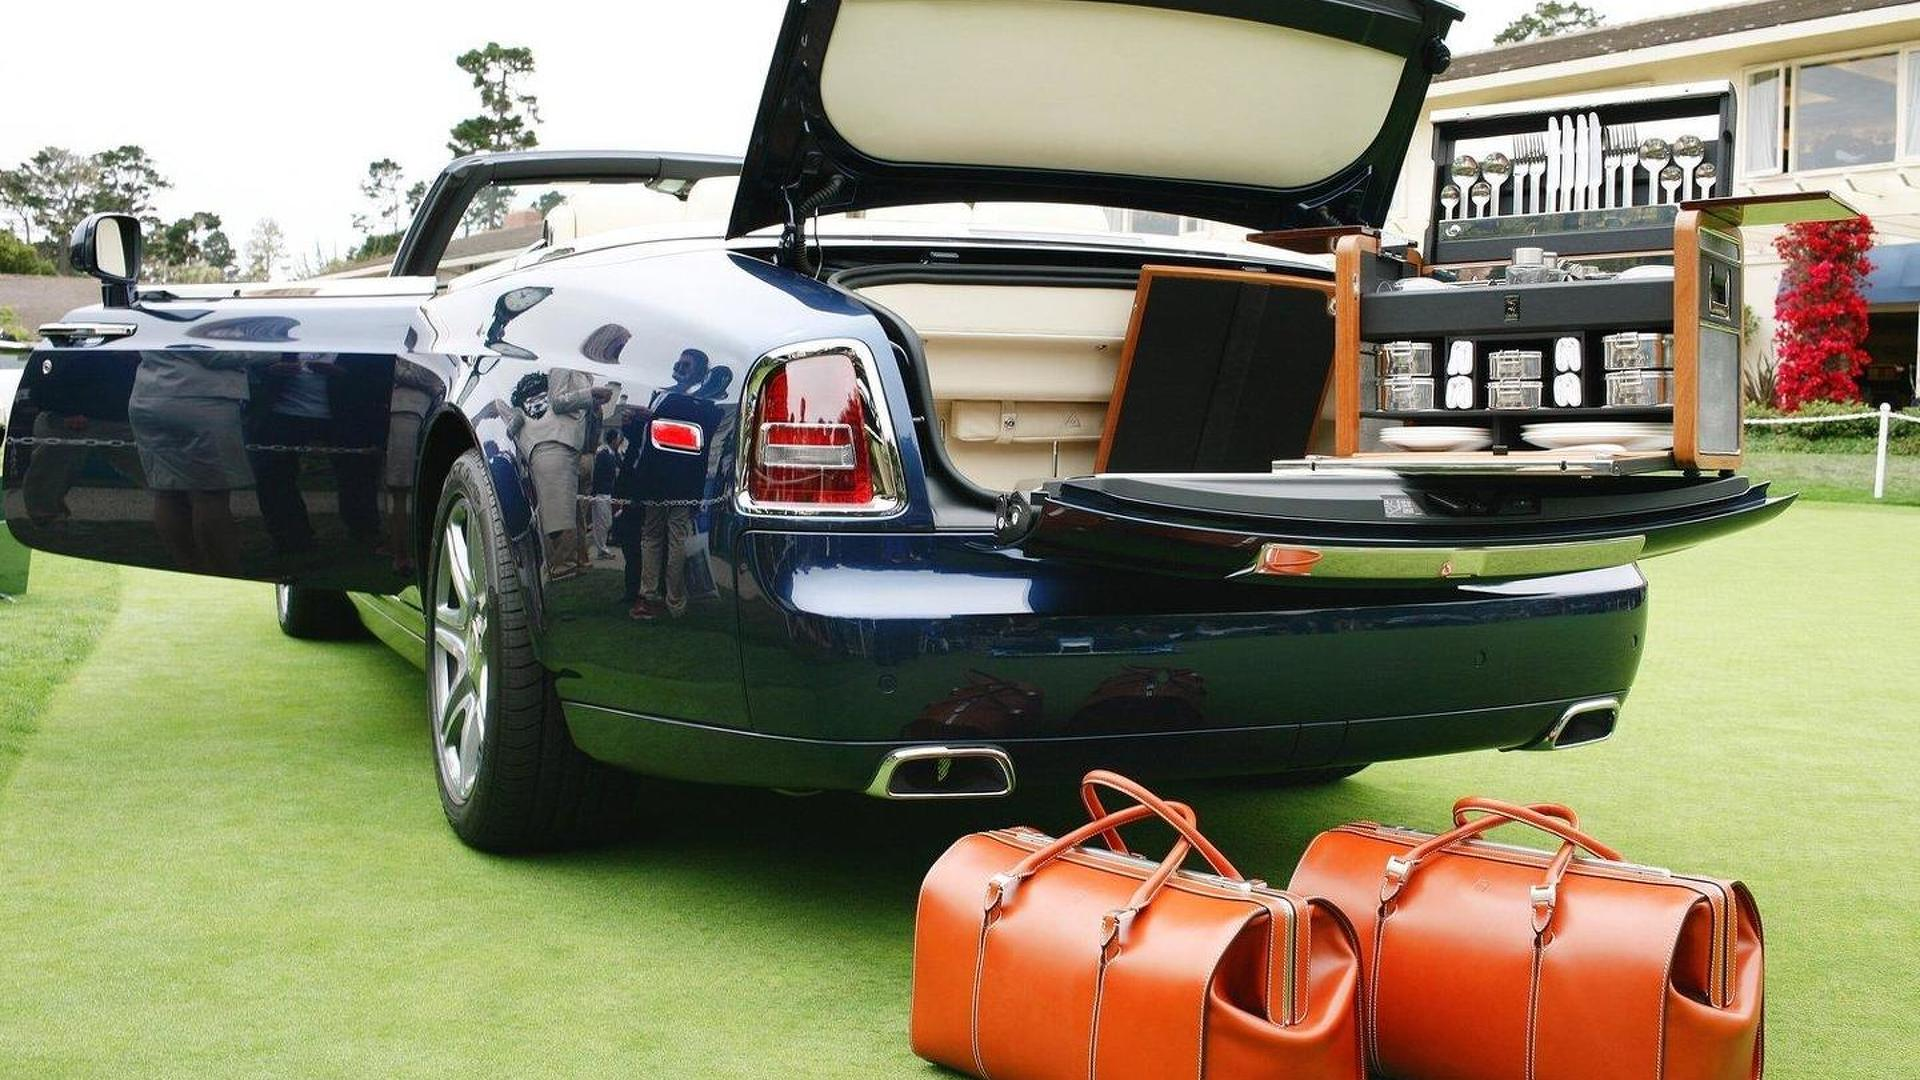 Rolls-Royce unveils Phantom Drophead Coupe Pebble Beach Special Edition [video]